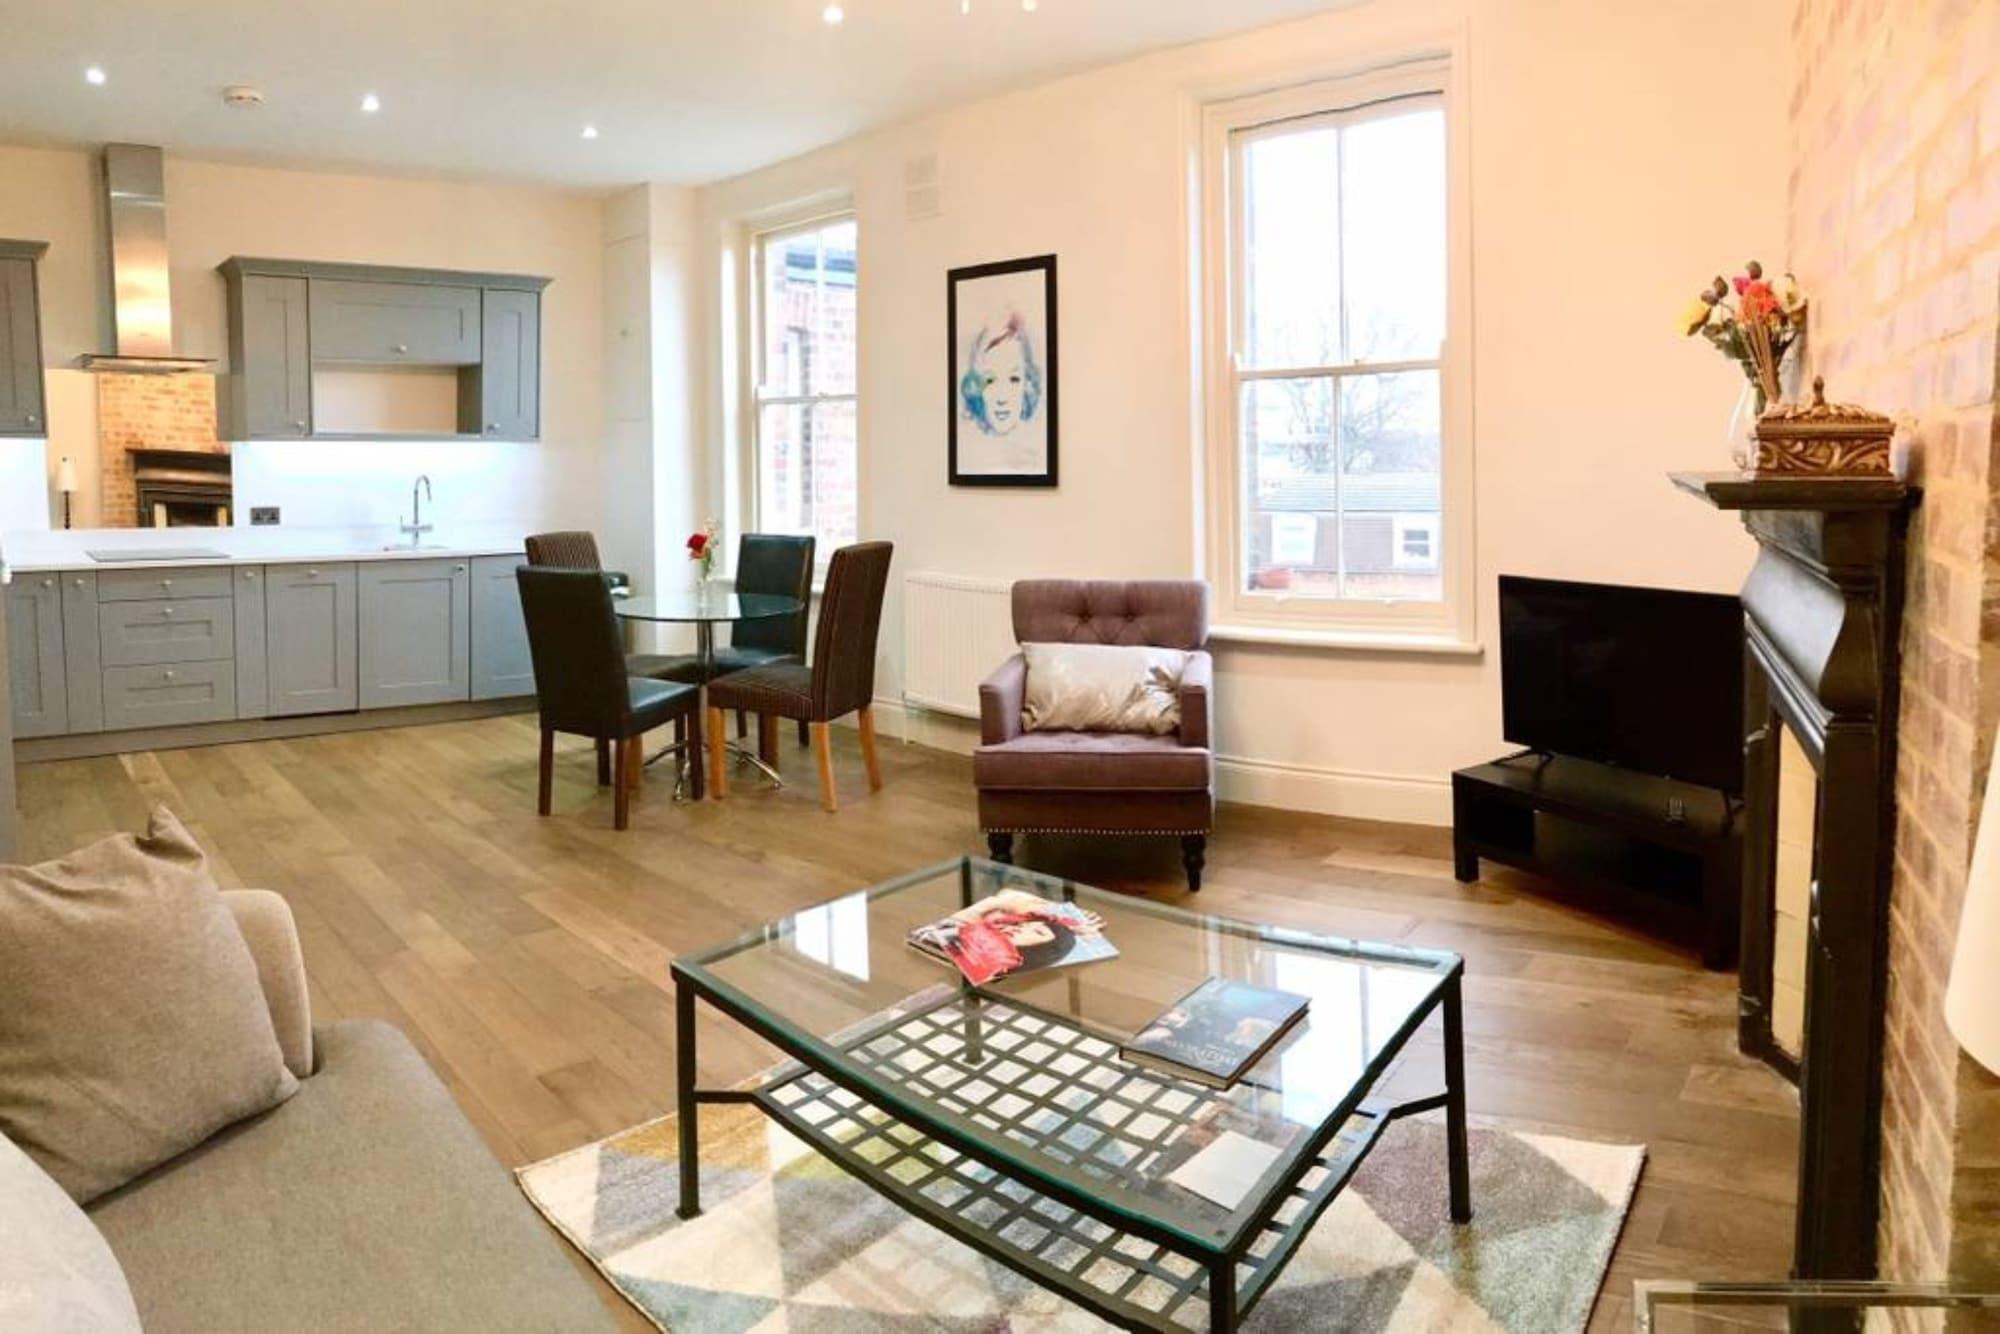 Newly Renovated 2 Bedroom Flat in Wimbledon Village, London